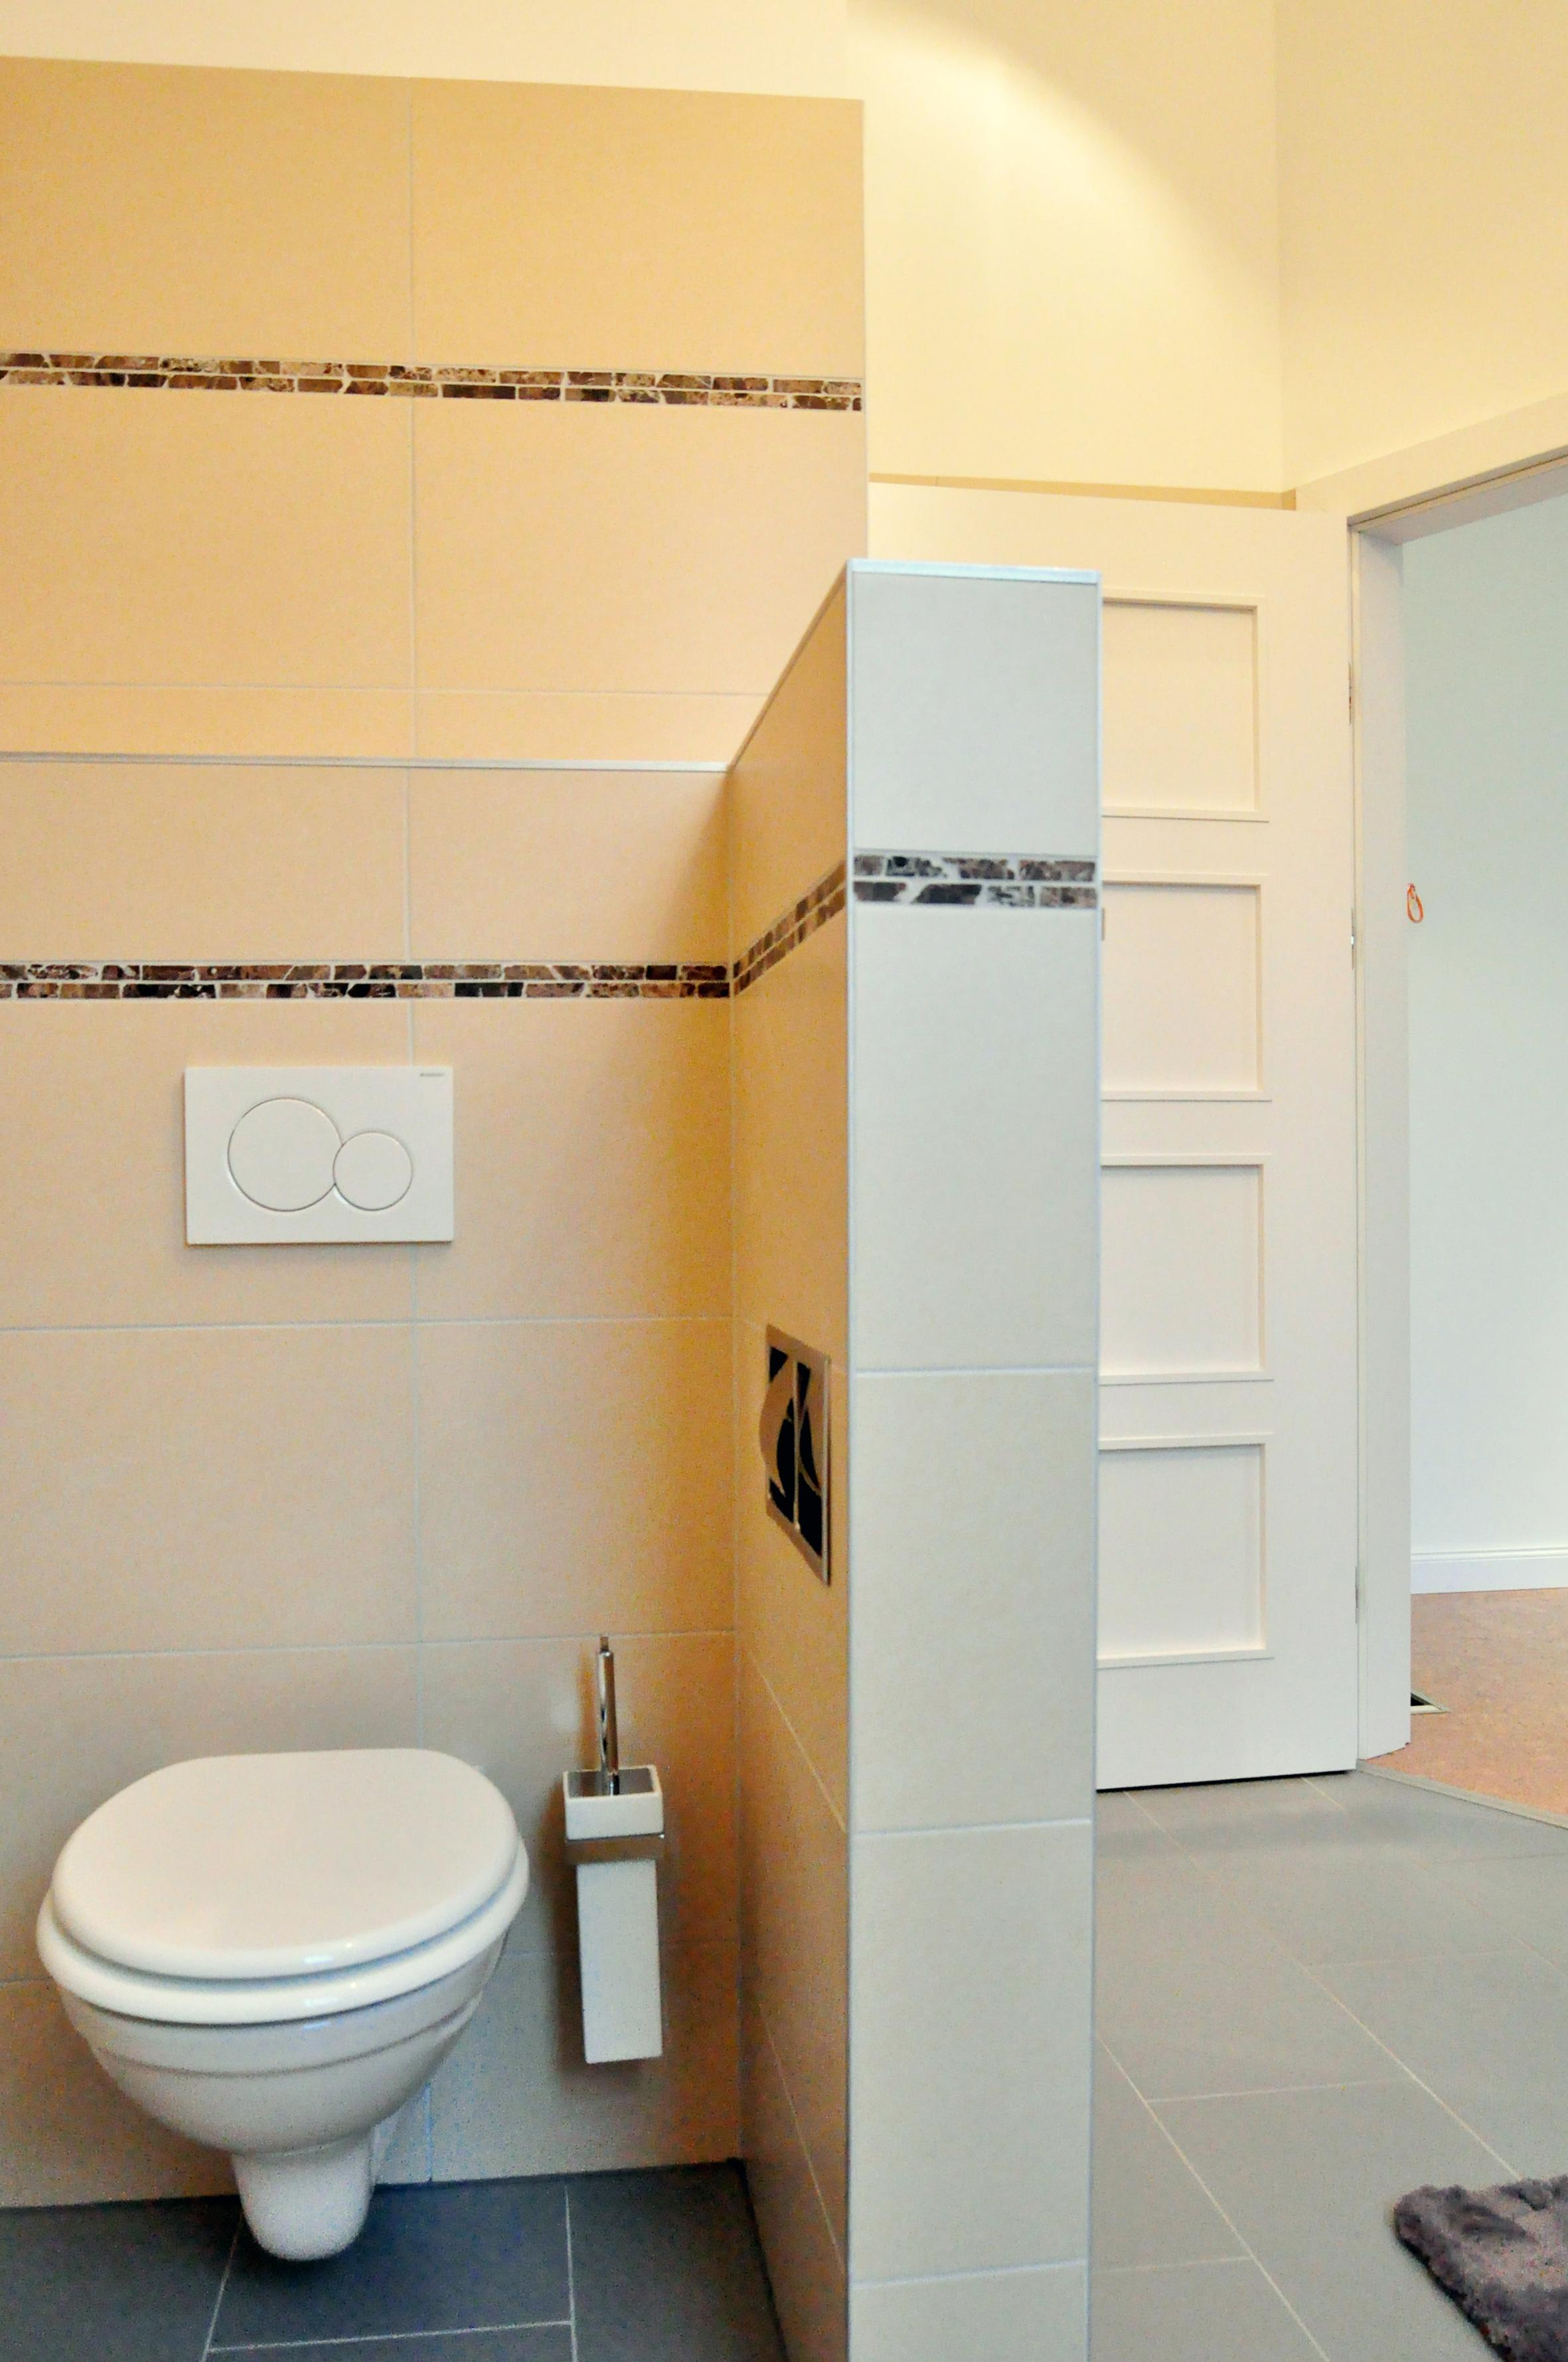 badezimmer • bilder & ideen • couchstyle, Badezimmer ideen